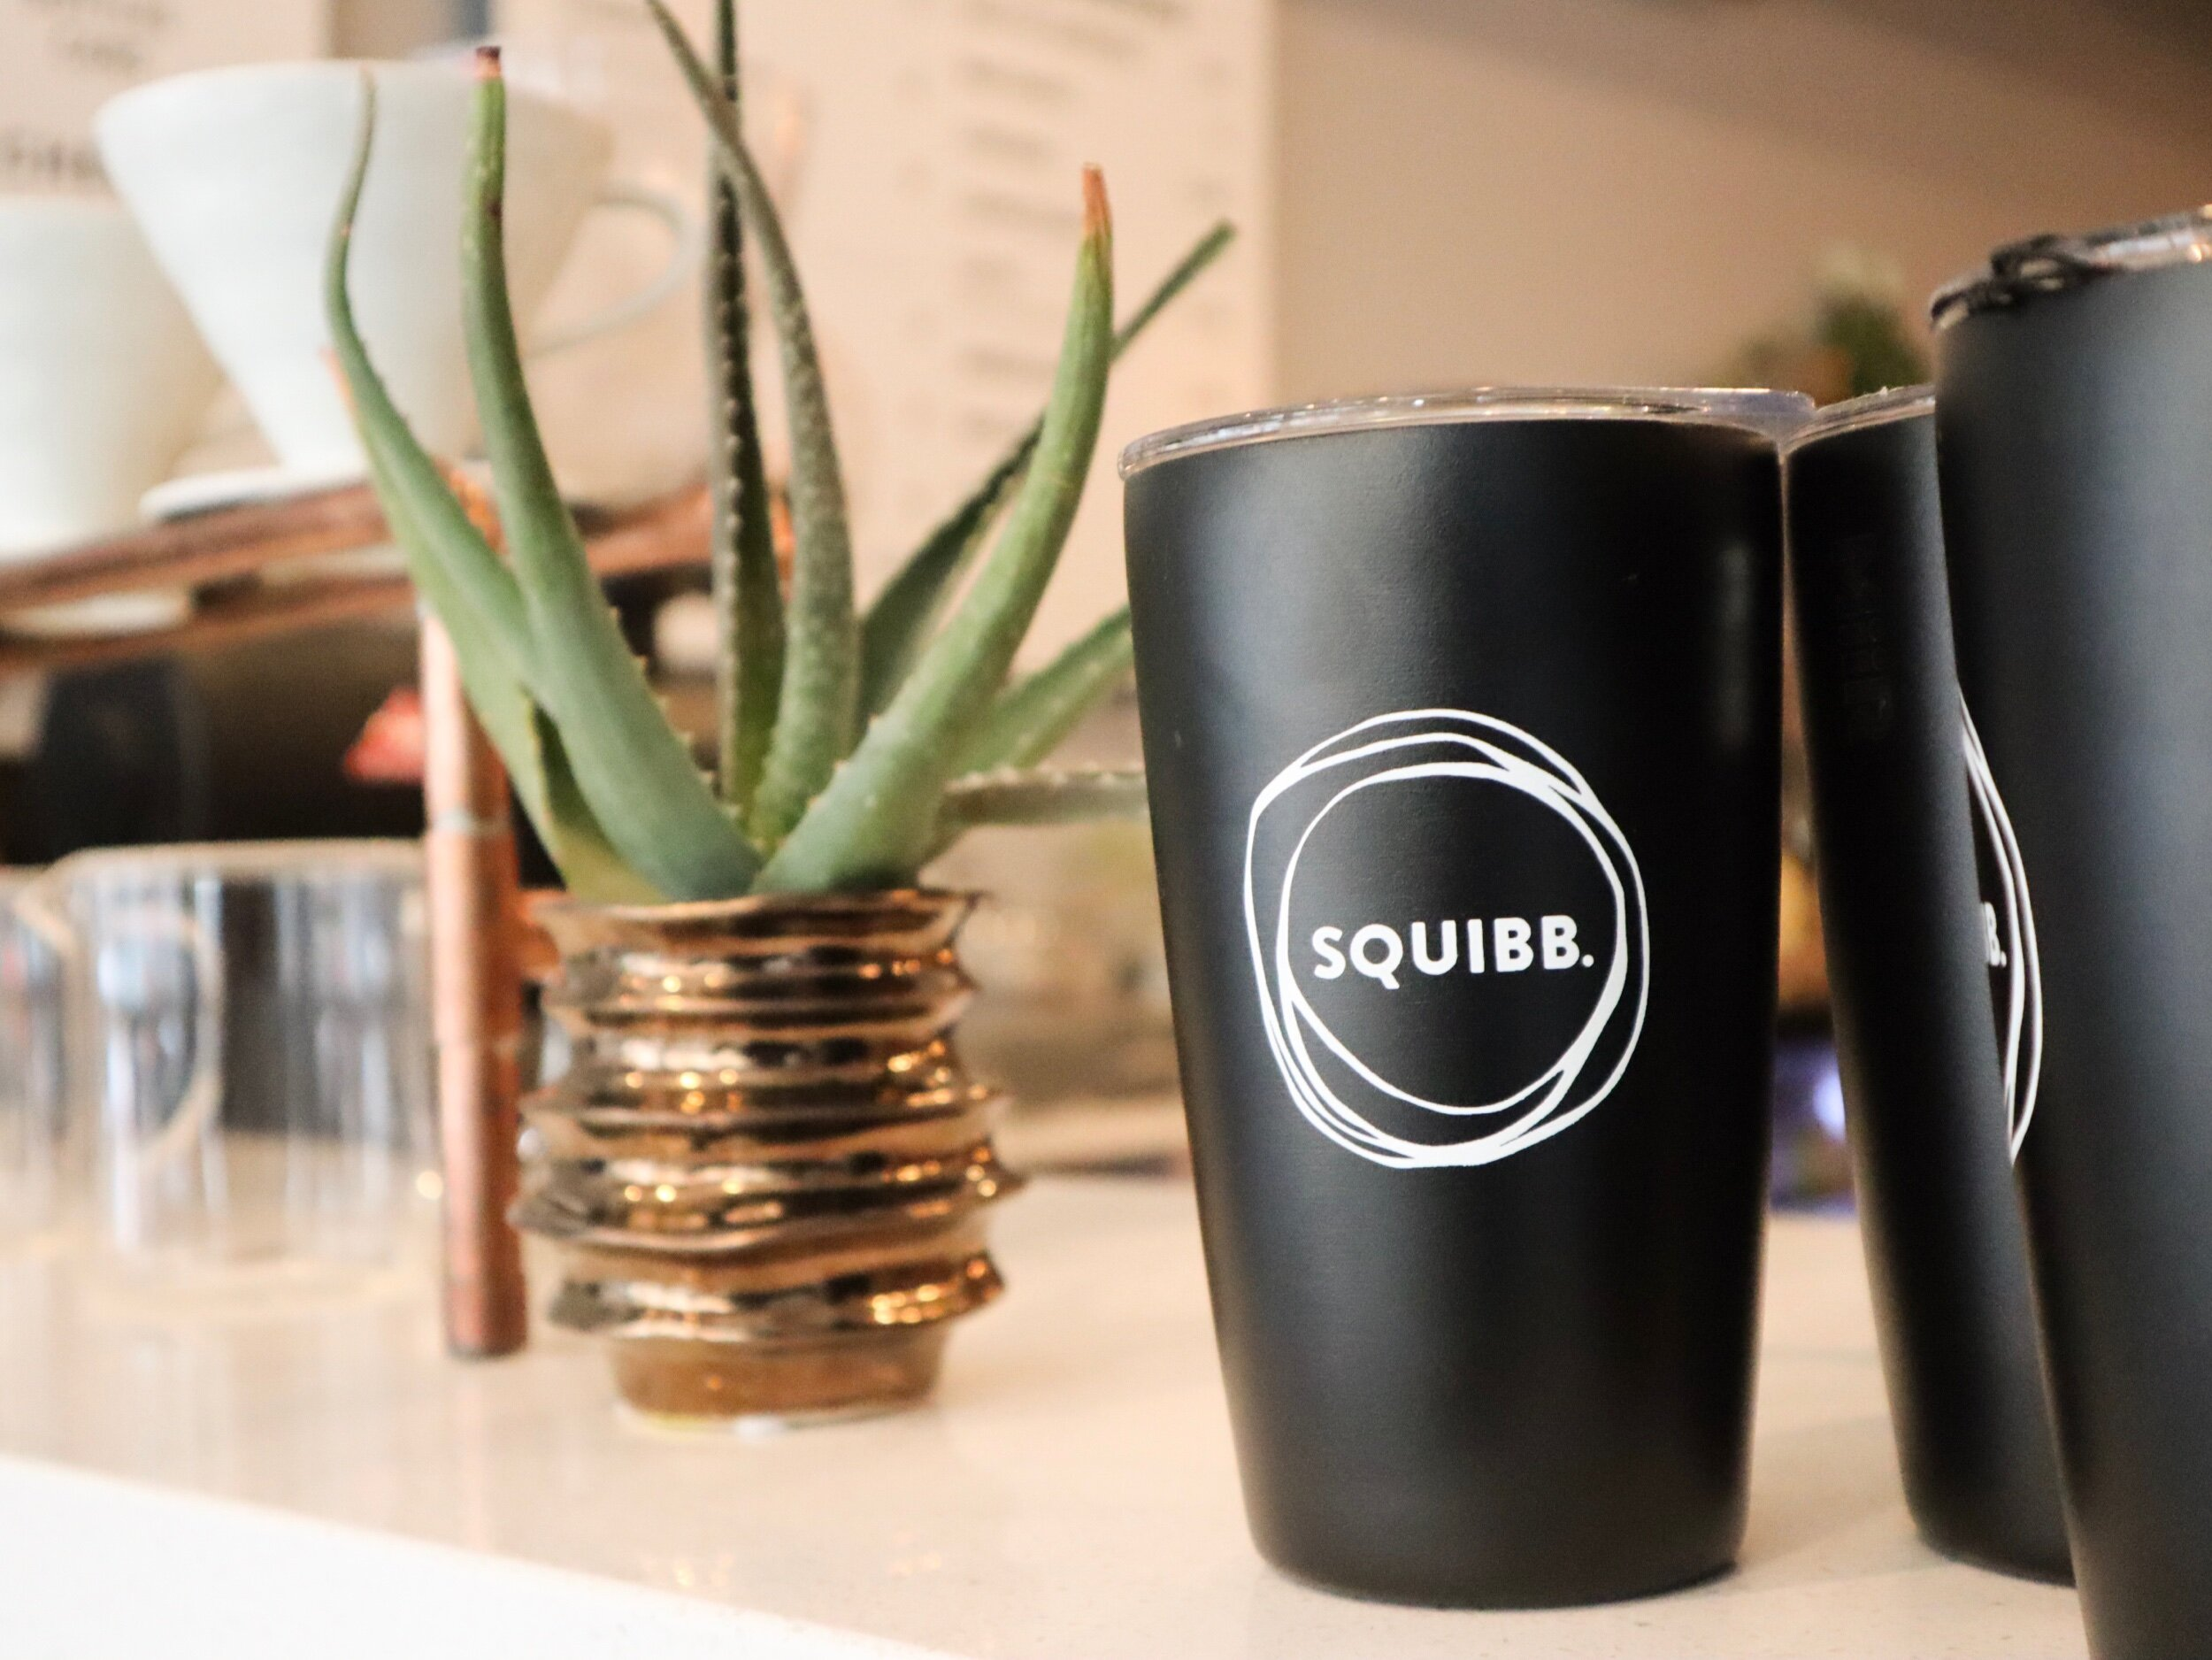 Squibb Coffee + Wine Bar!